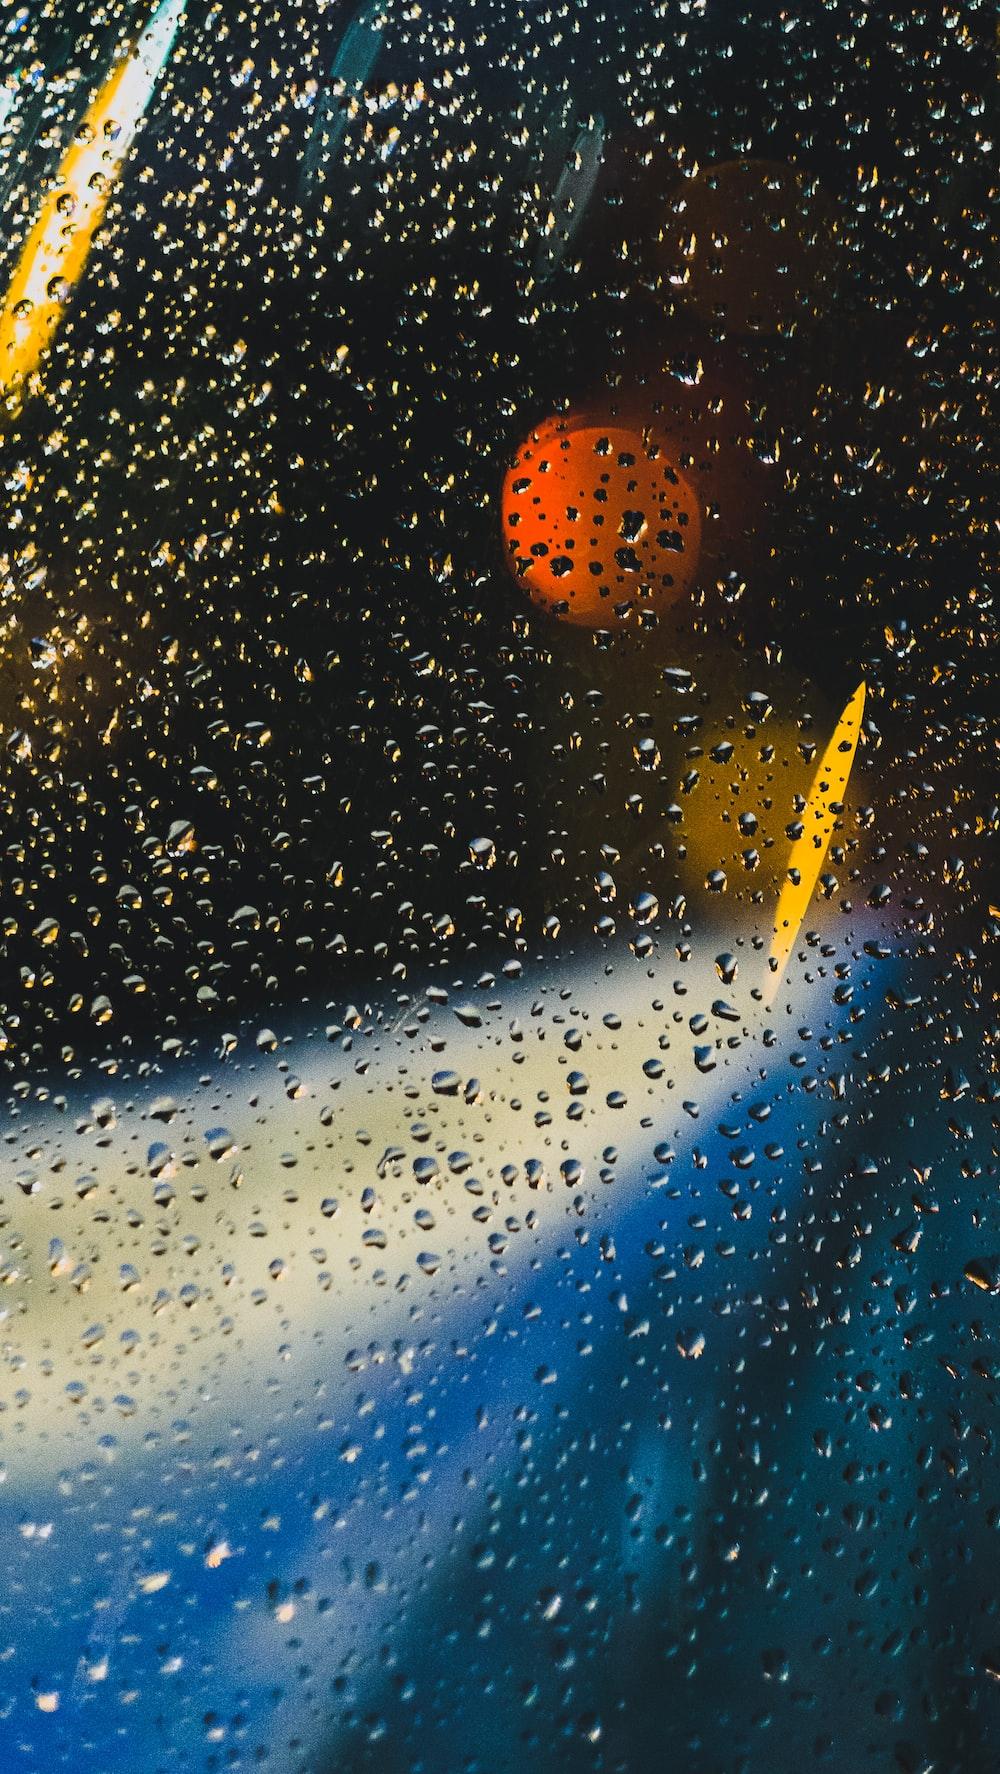 closeup photo of water dew on window